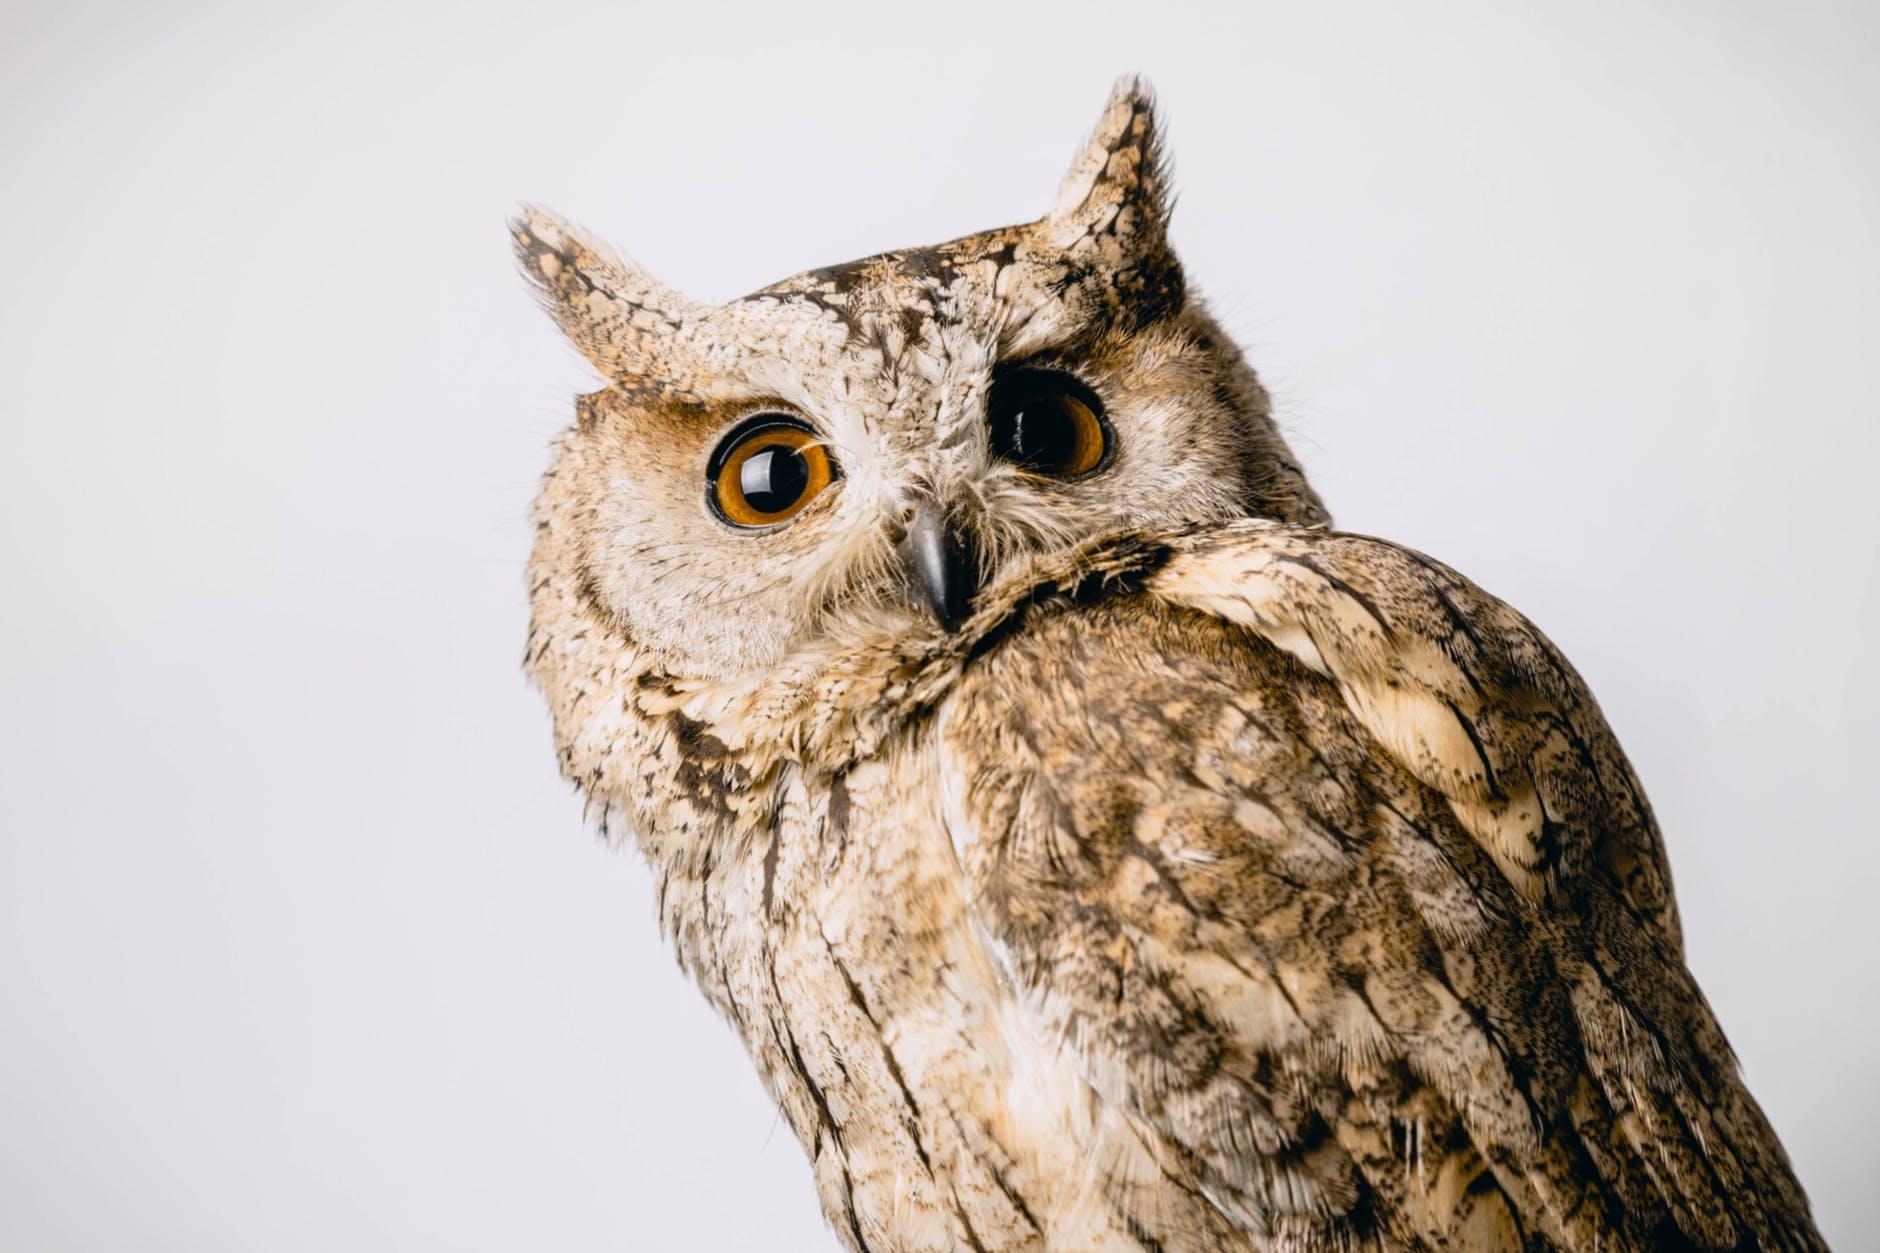 close up photo of owl